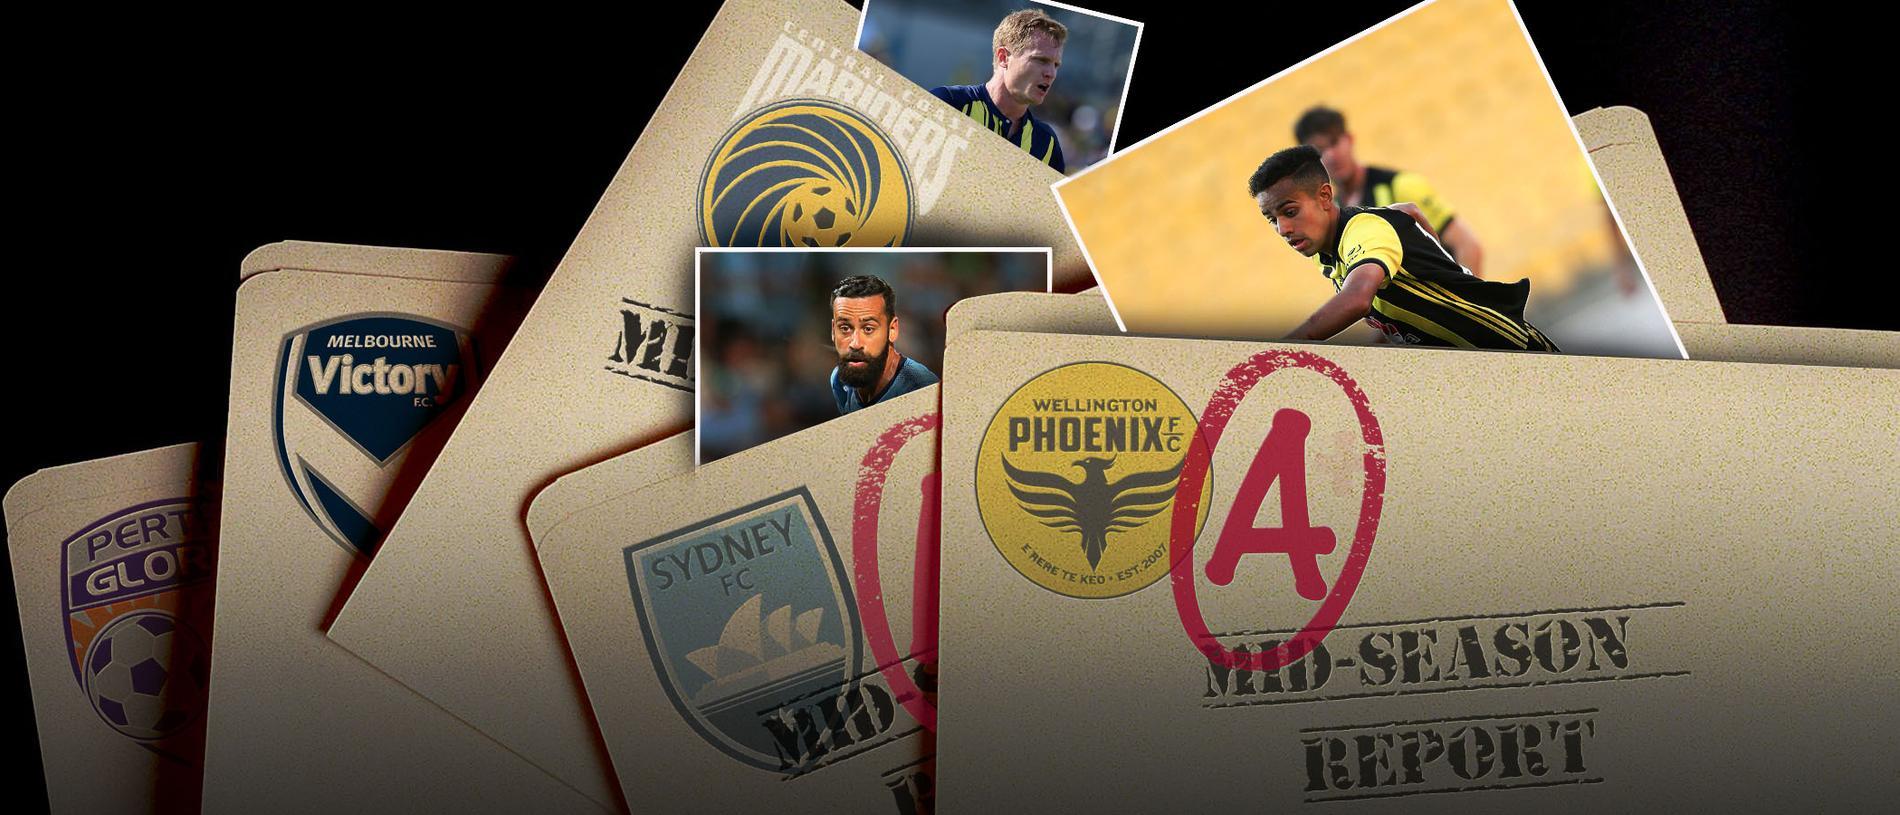 The A-League's mid-season report card.